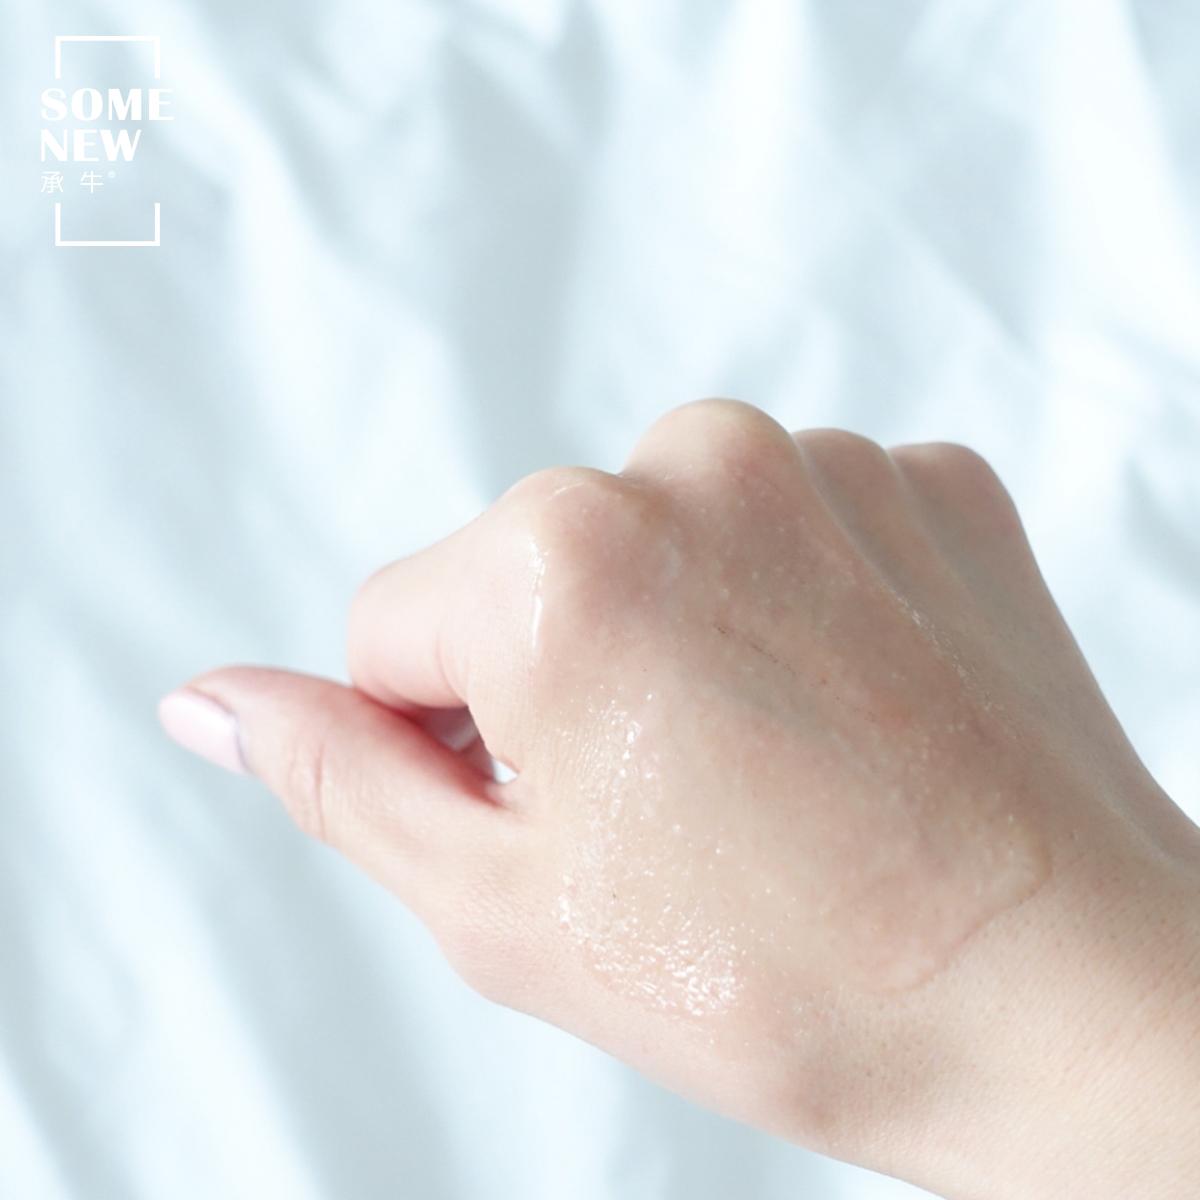 100ml 清洁毛孔卸妆膏 经典洁颜霜 LOM EVE 英国 级卸妆体验 SPA